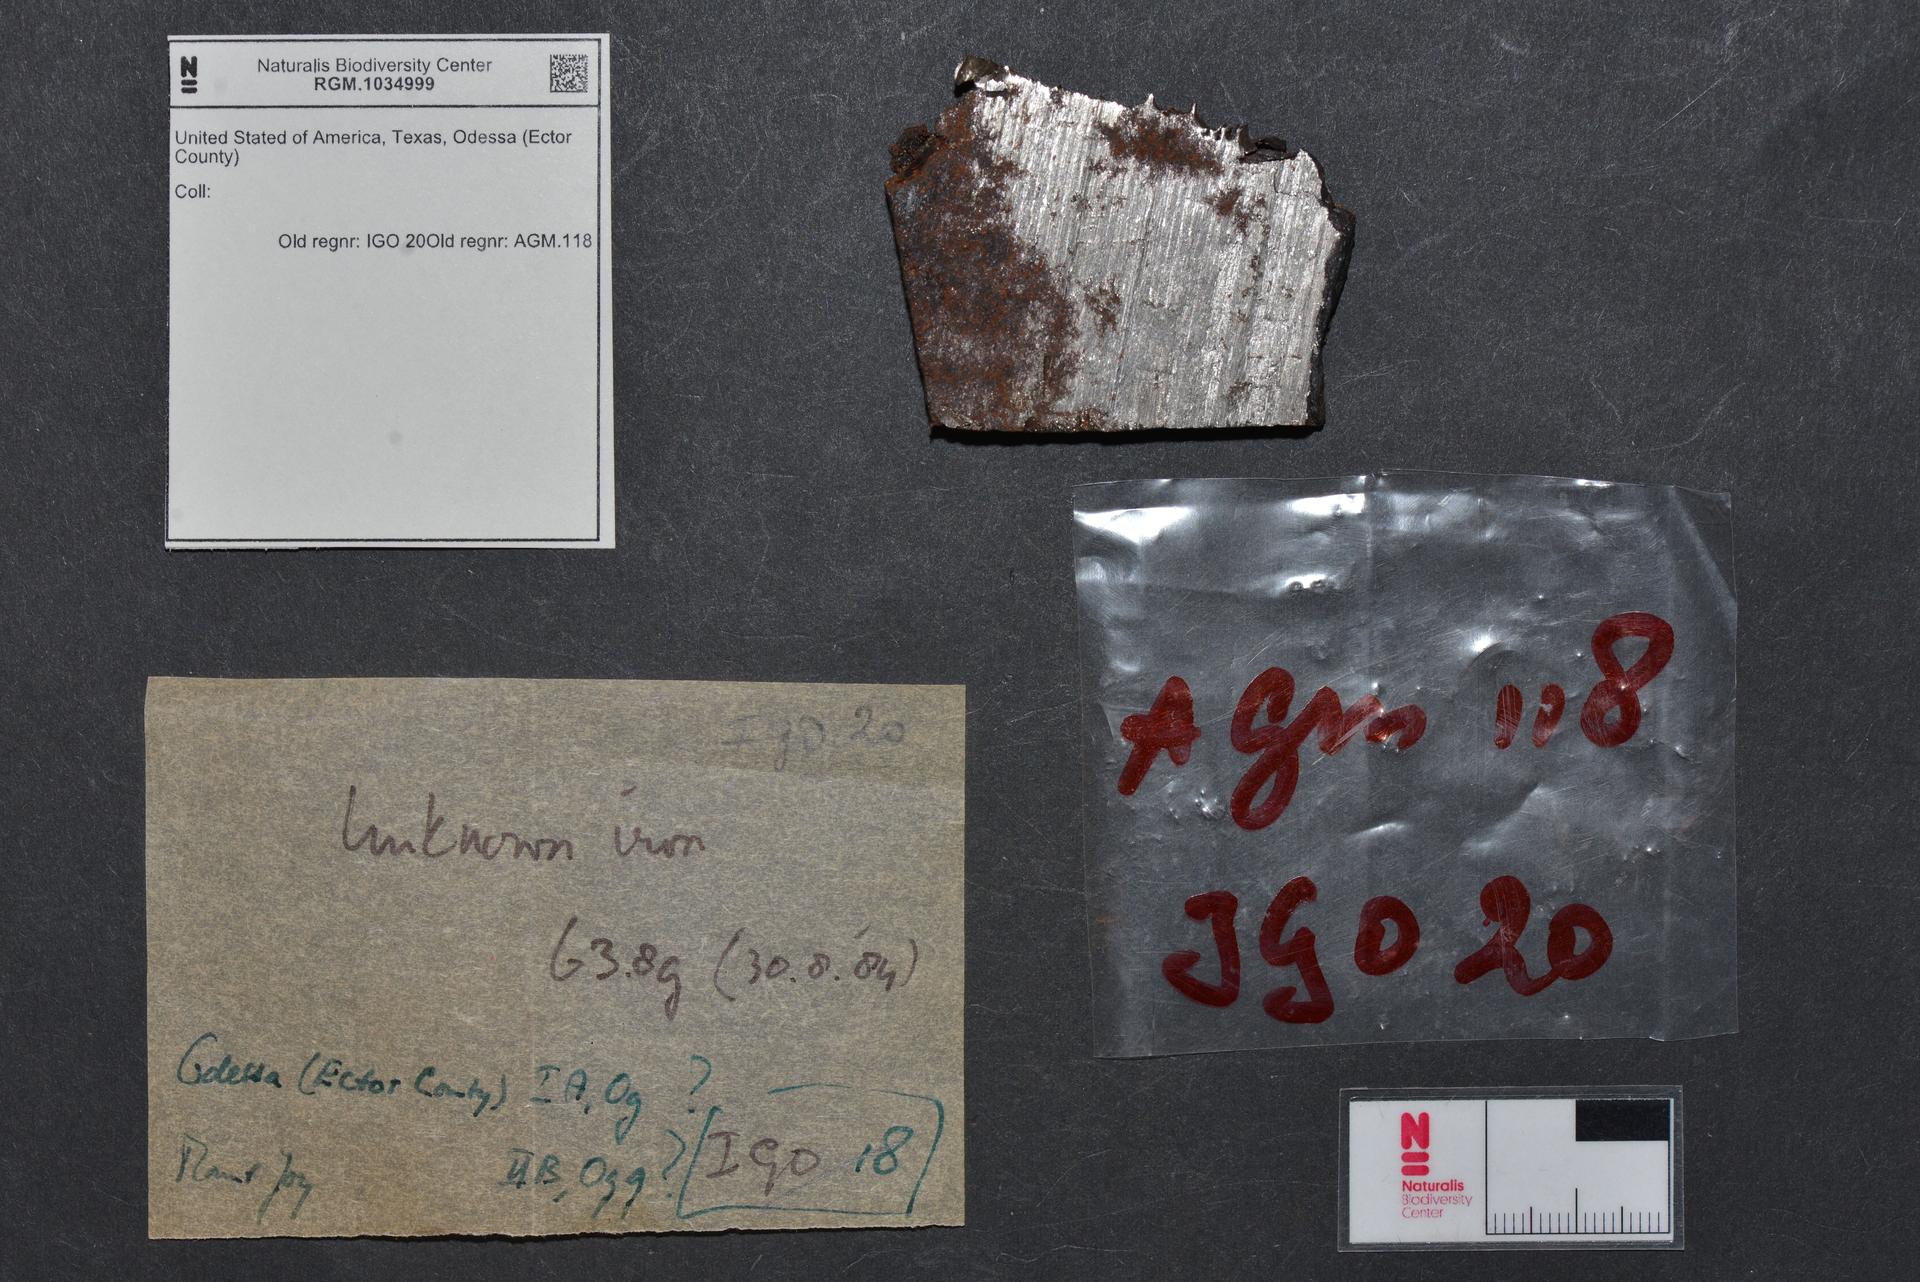 RGM.1034999 | Iron, IAB-MG